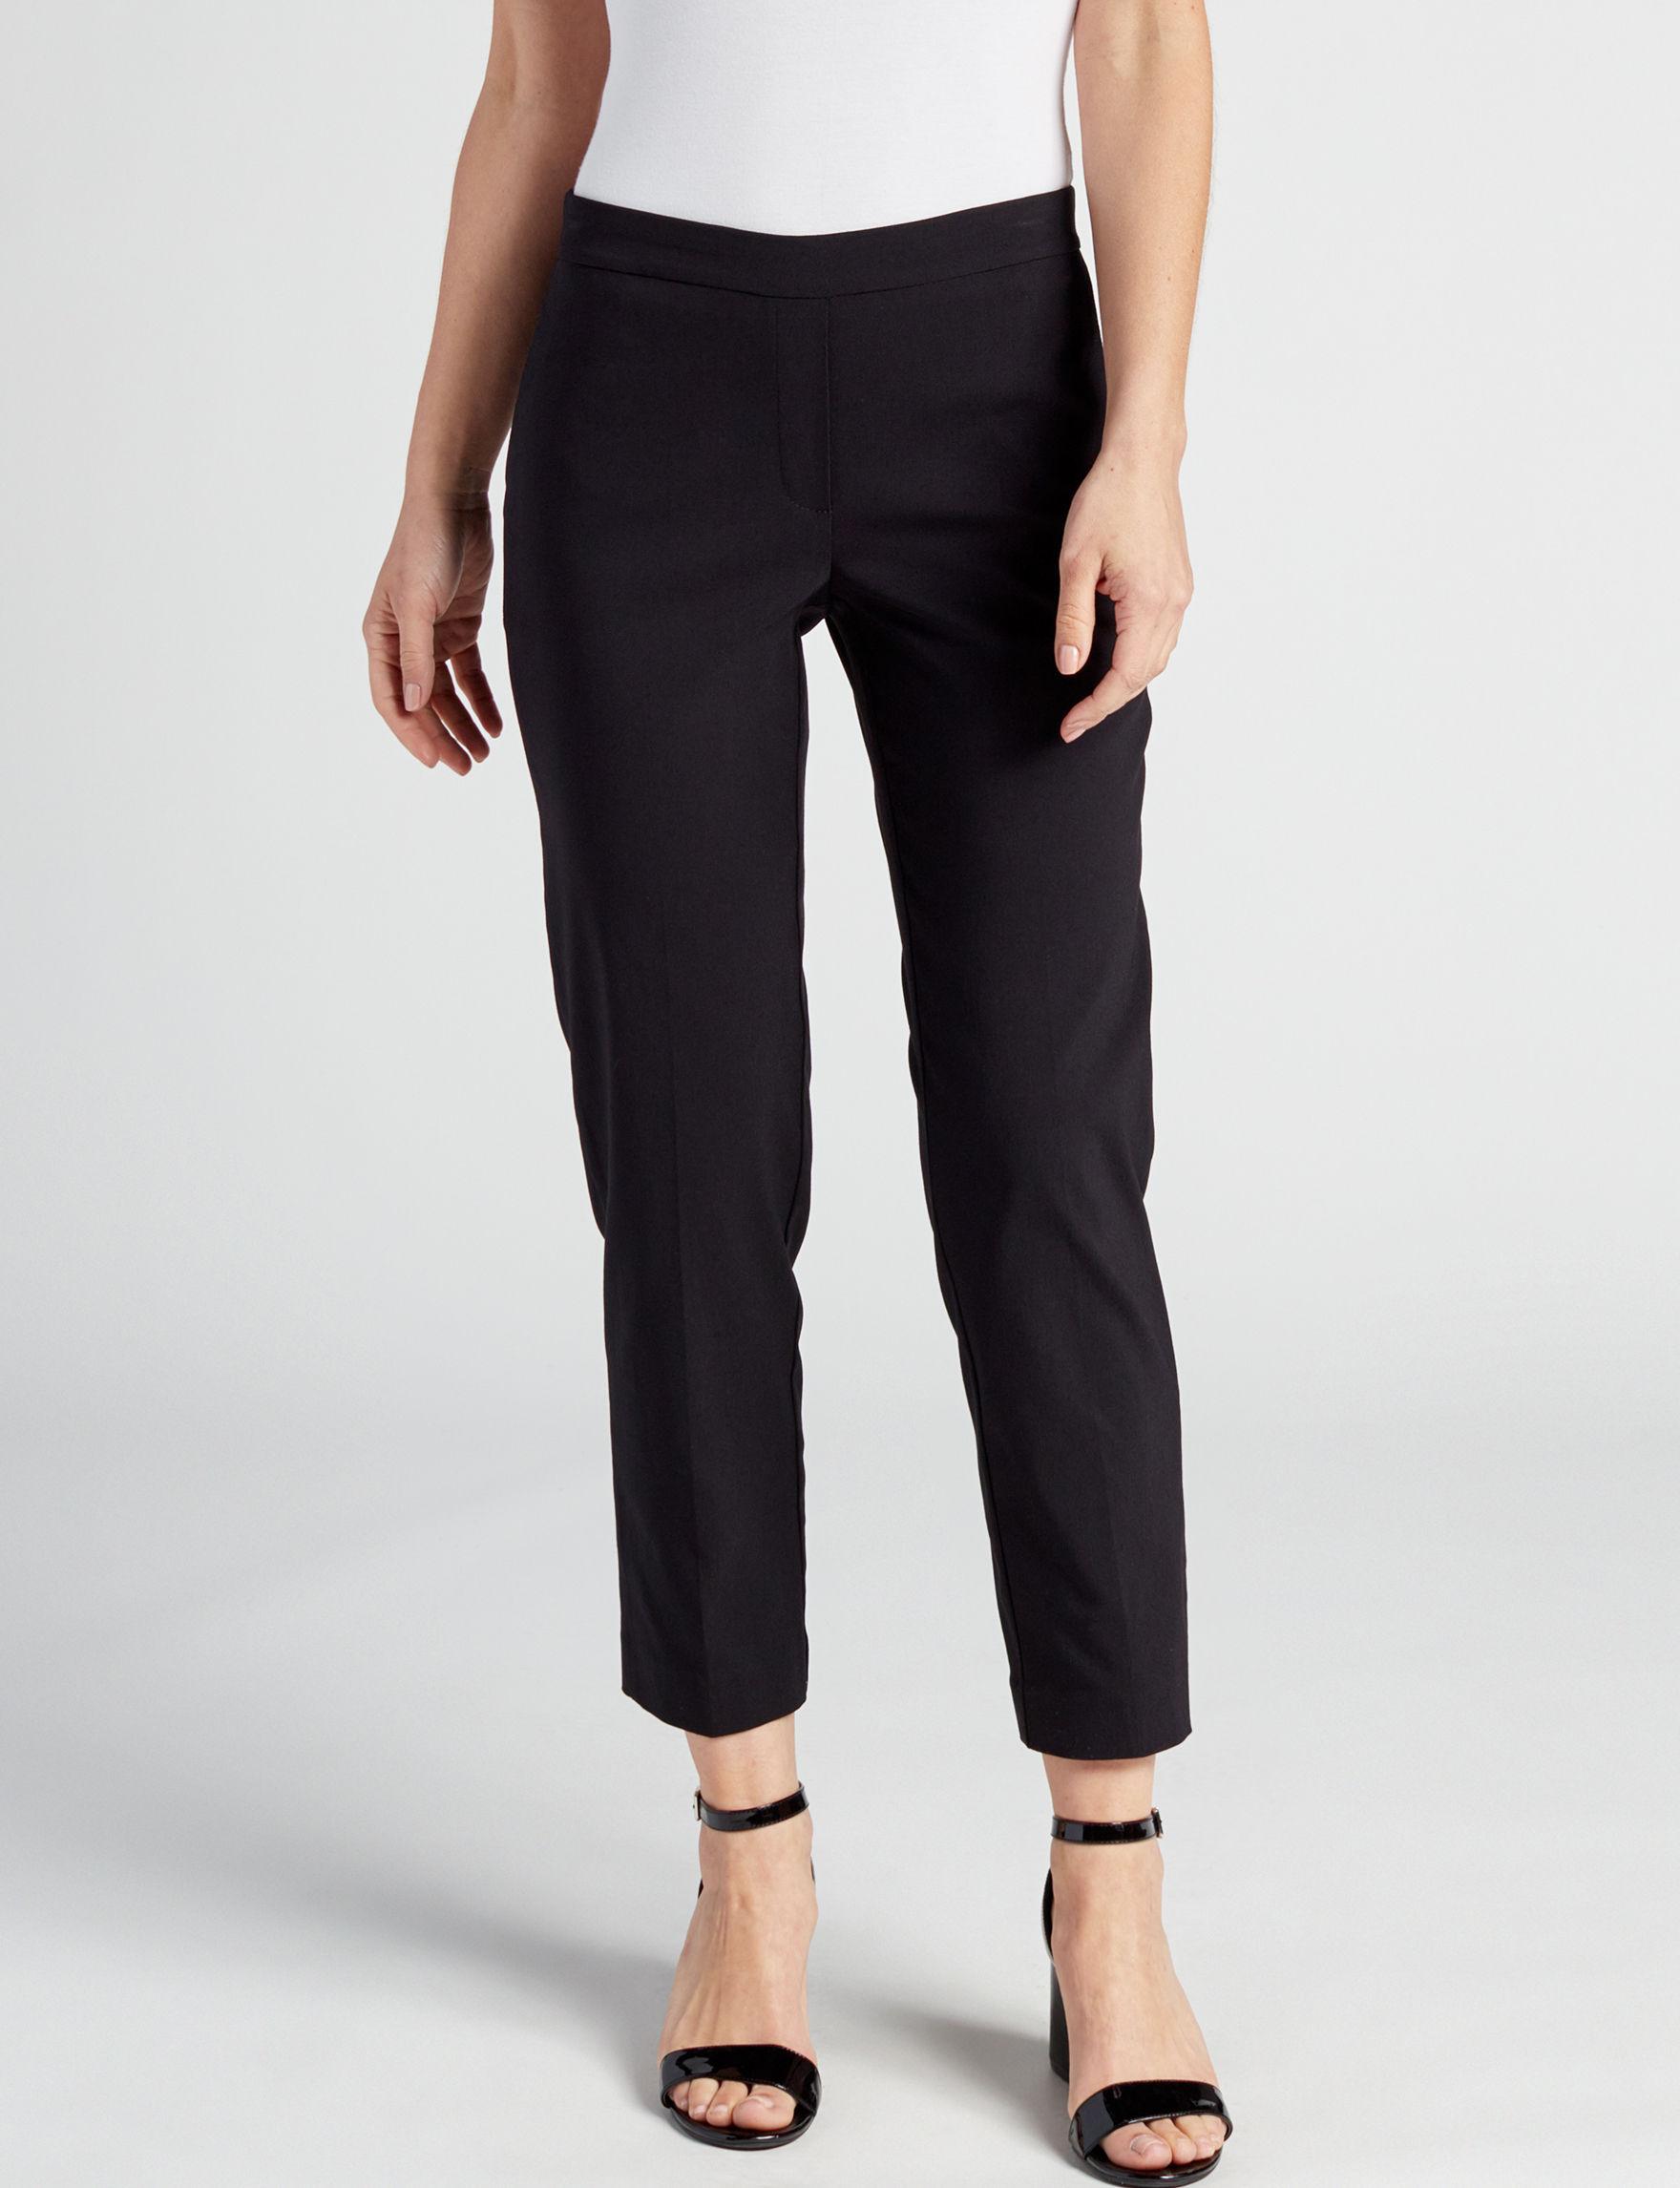 Valerie Stevens Black Soft Pants Straight Stretch